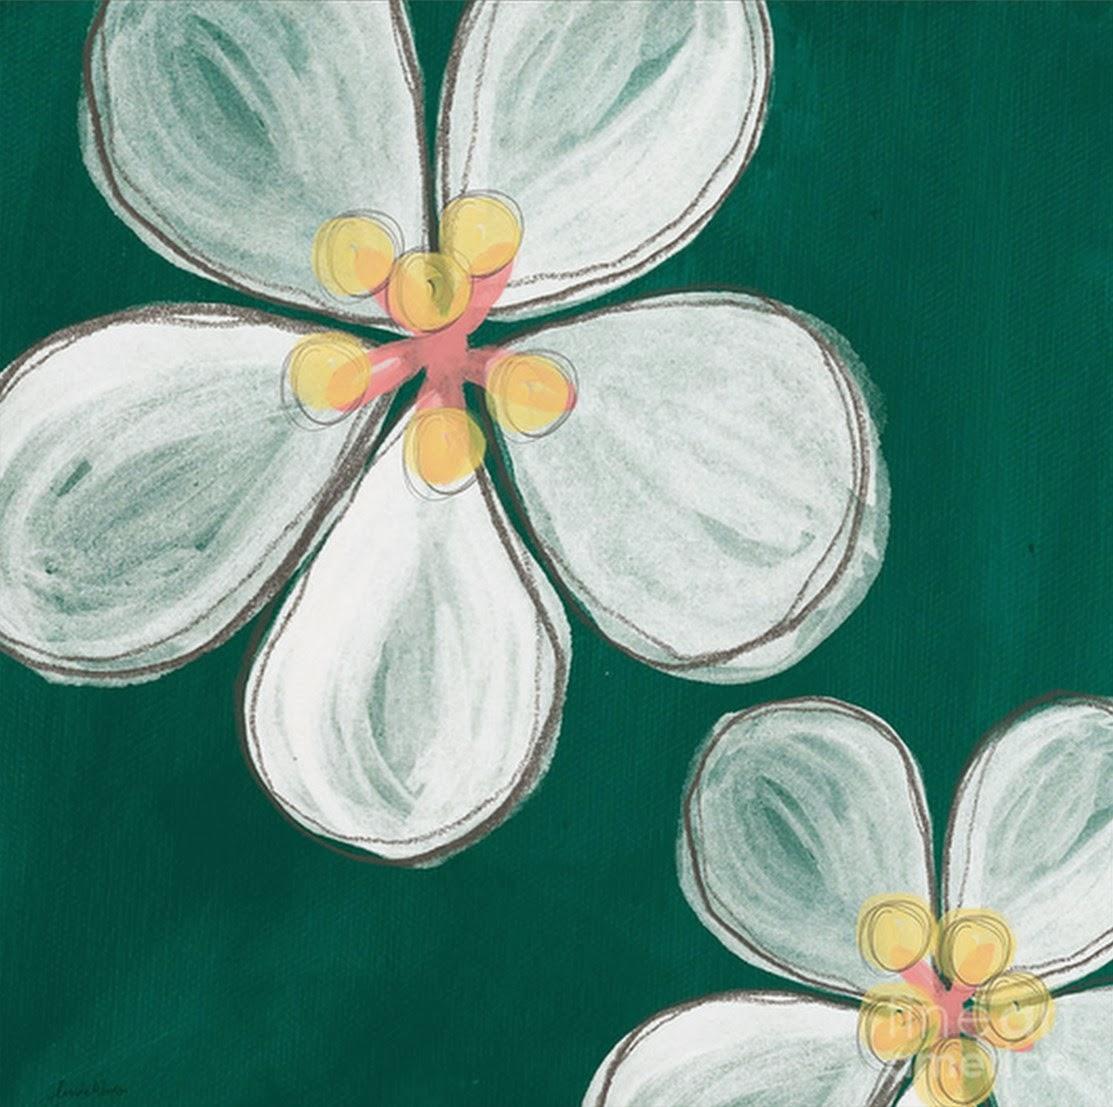 Pintura moderna y fotograf a art stica para estudiantes - Cuadros para principiantes ...